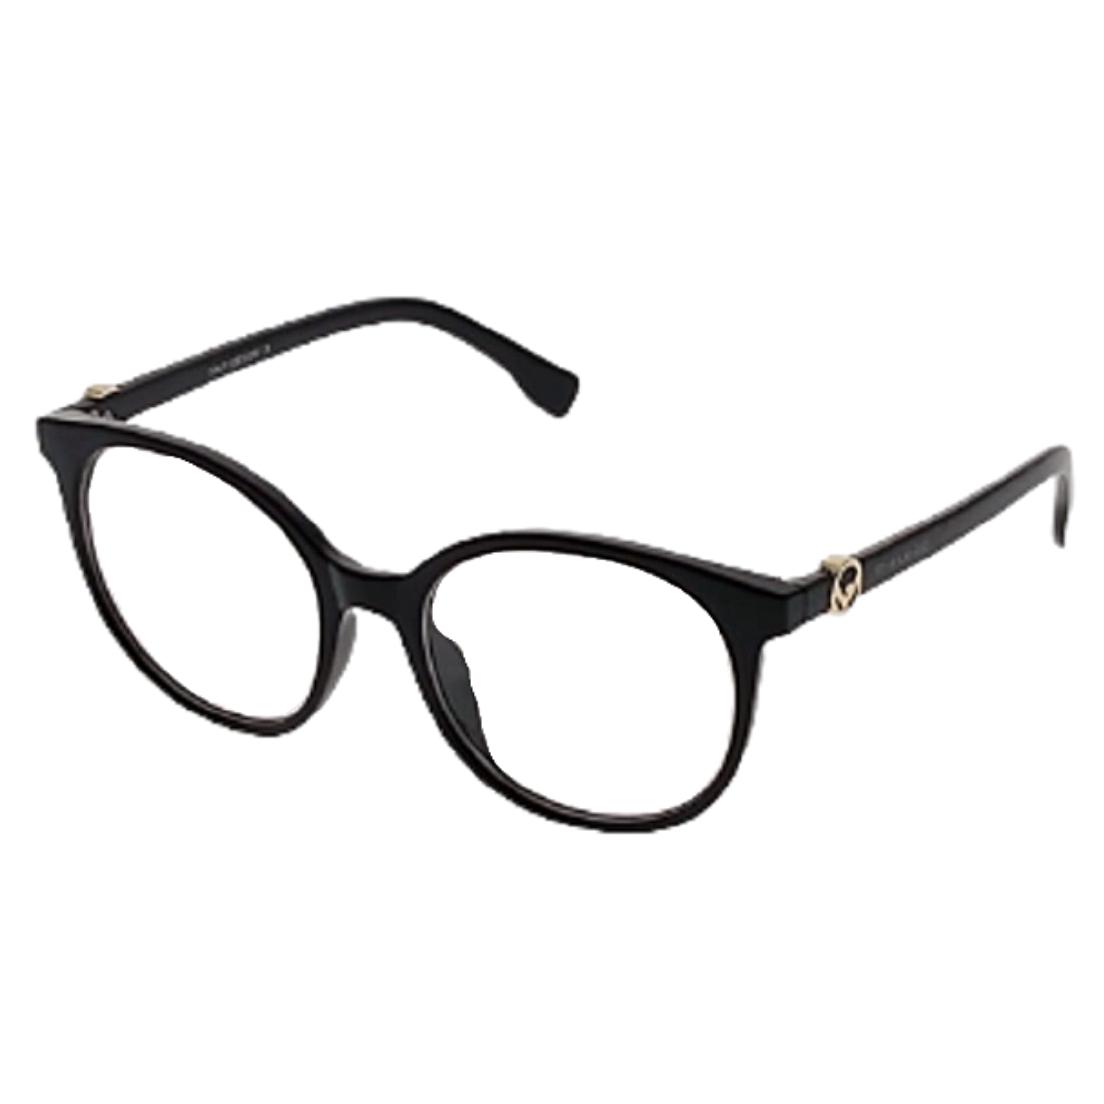 Armação de Óculos Khatto Cat Kel - PU